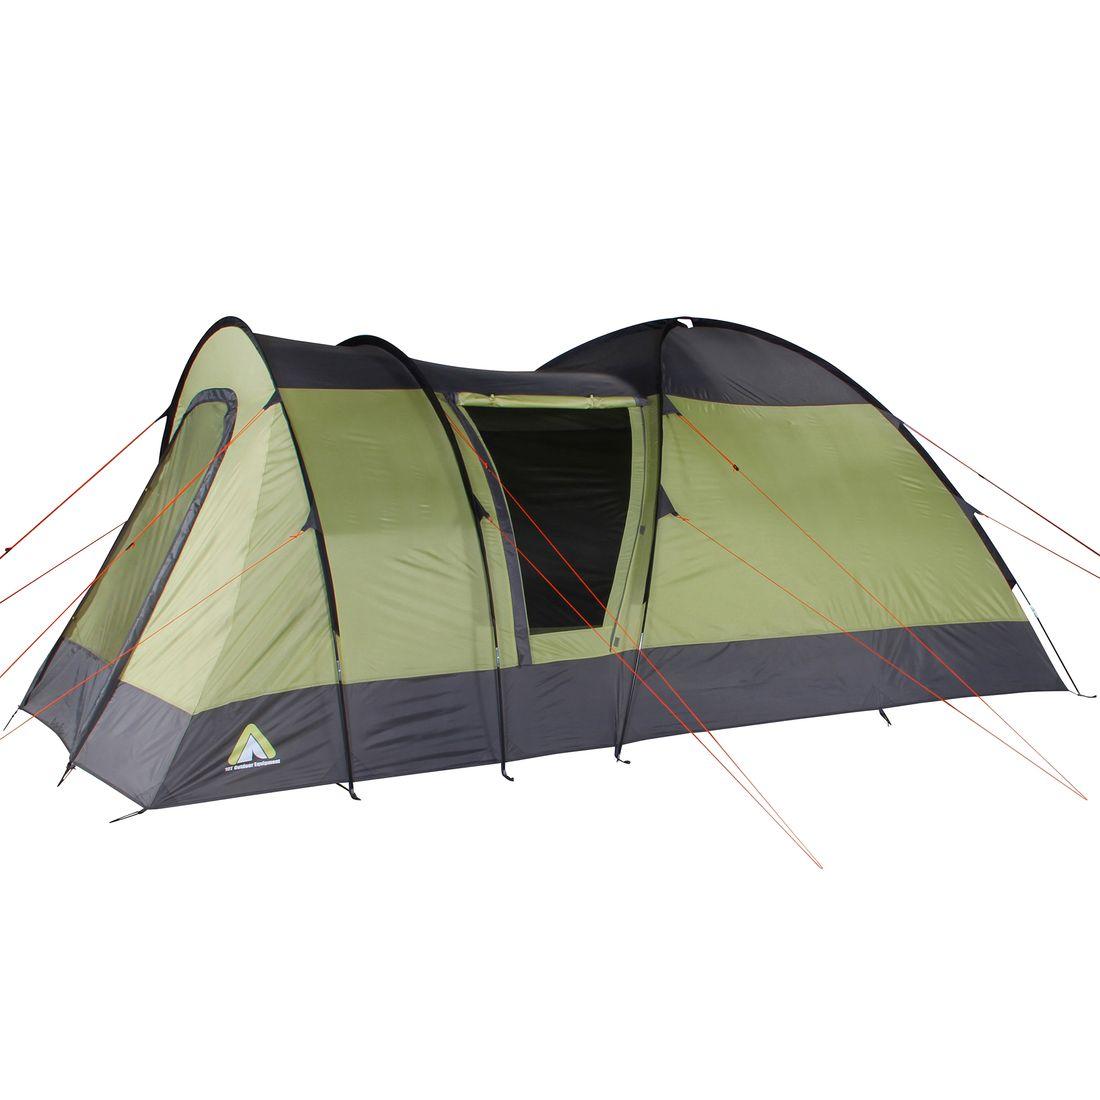 Zelt SiliconeBiker 2 Mann Trekkingzelt Campingzelt 5000mm